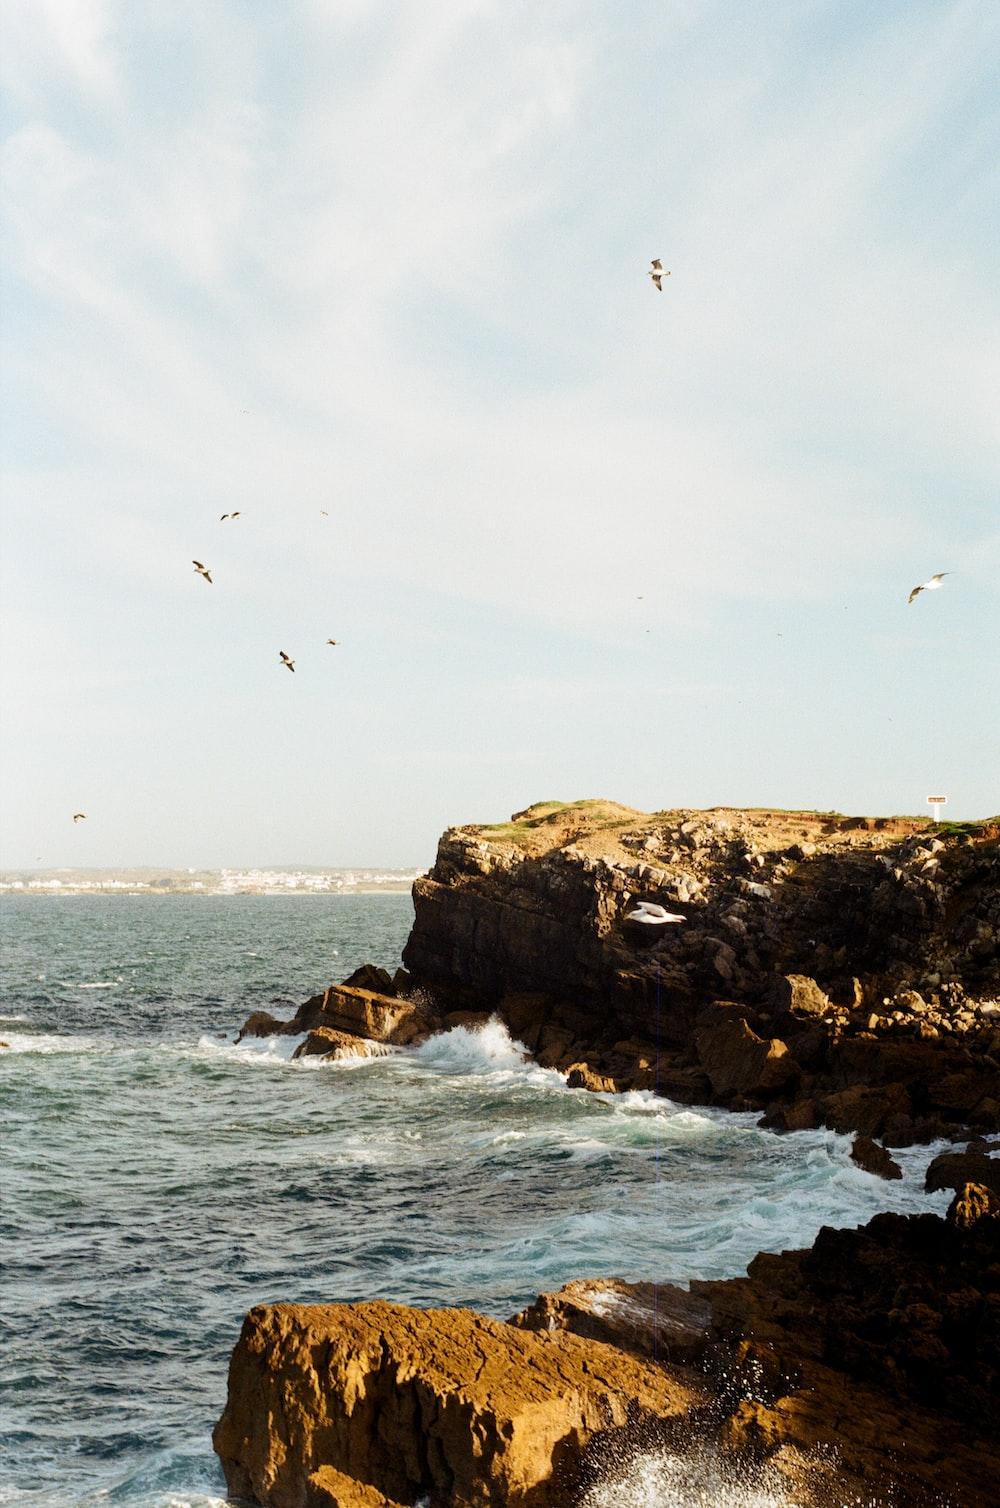 flock of birds flying under the sea